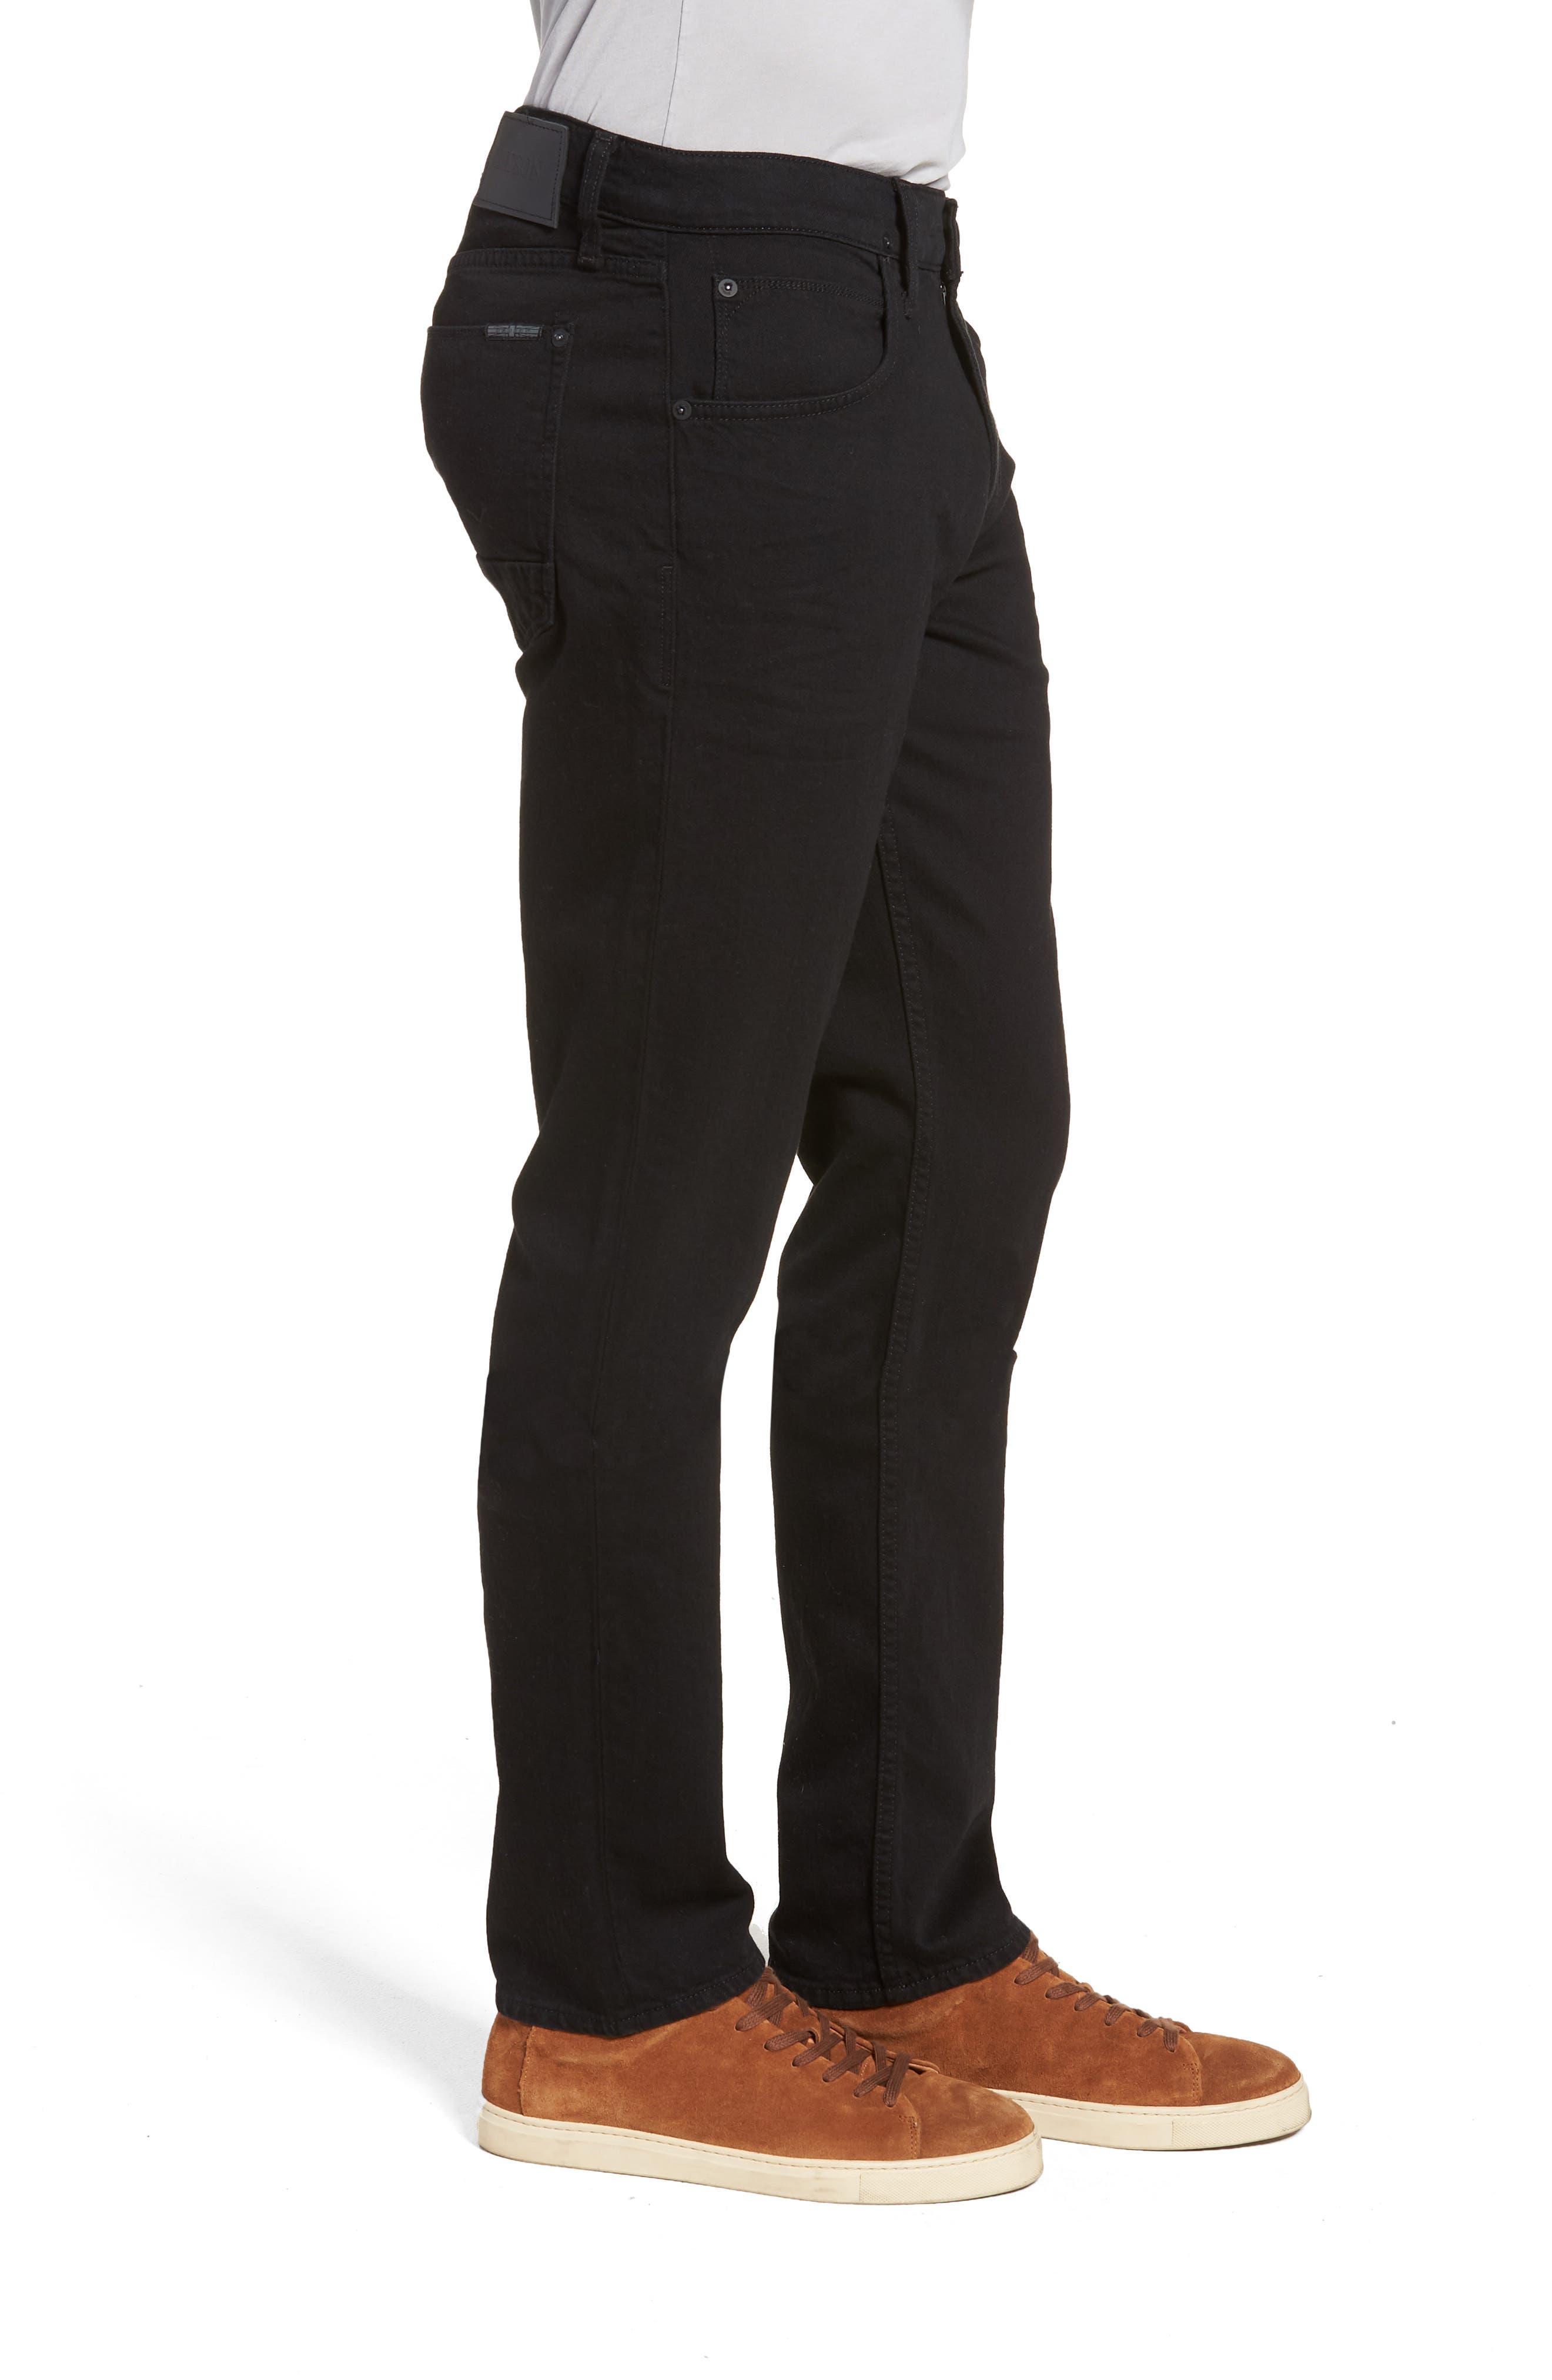 Blake Slim Fit Jeans,                             Alternate thumbnail 3, color,                             002